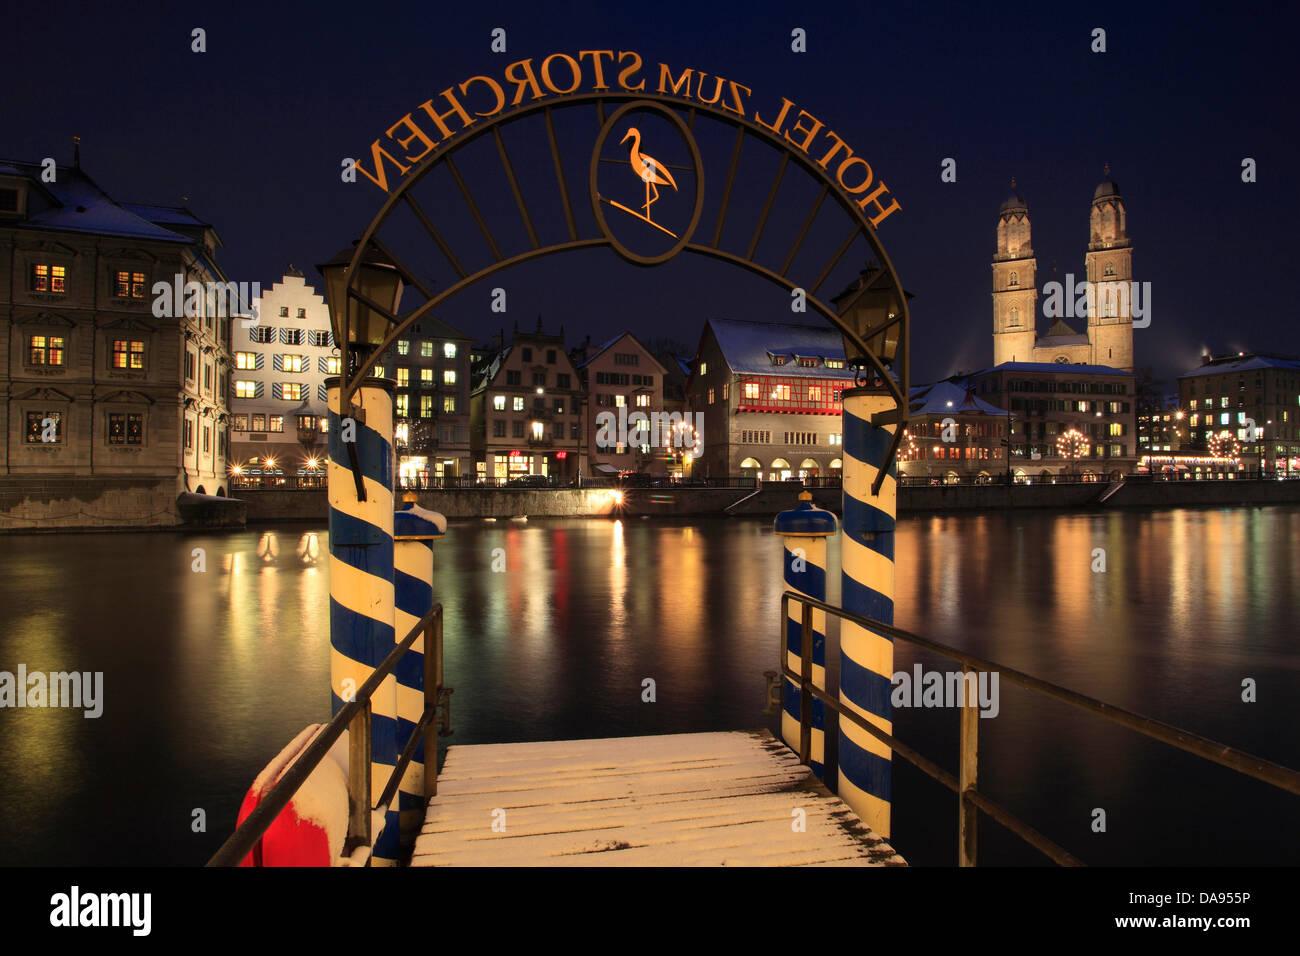 Advent, lighting, illumination, Advent time, Old Town, landing stage, landing stage, city, dusk, twilight, Grossmünster, - Stock Image